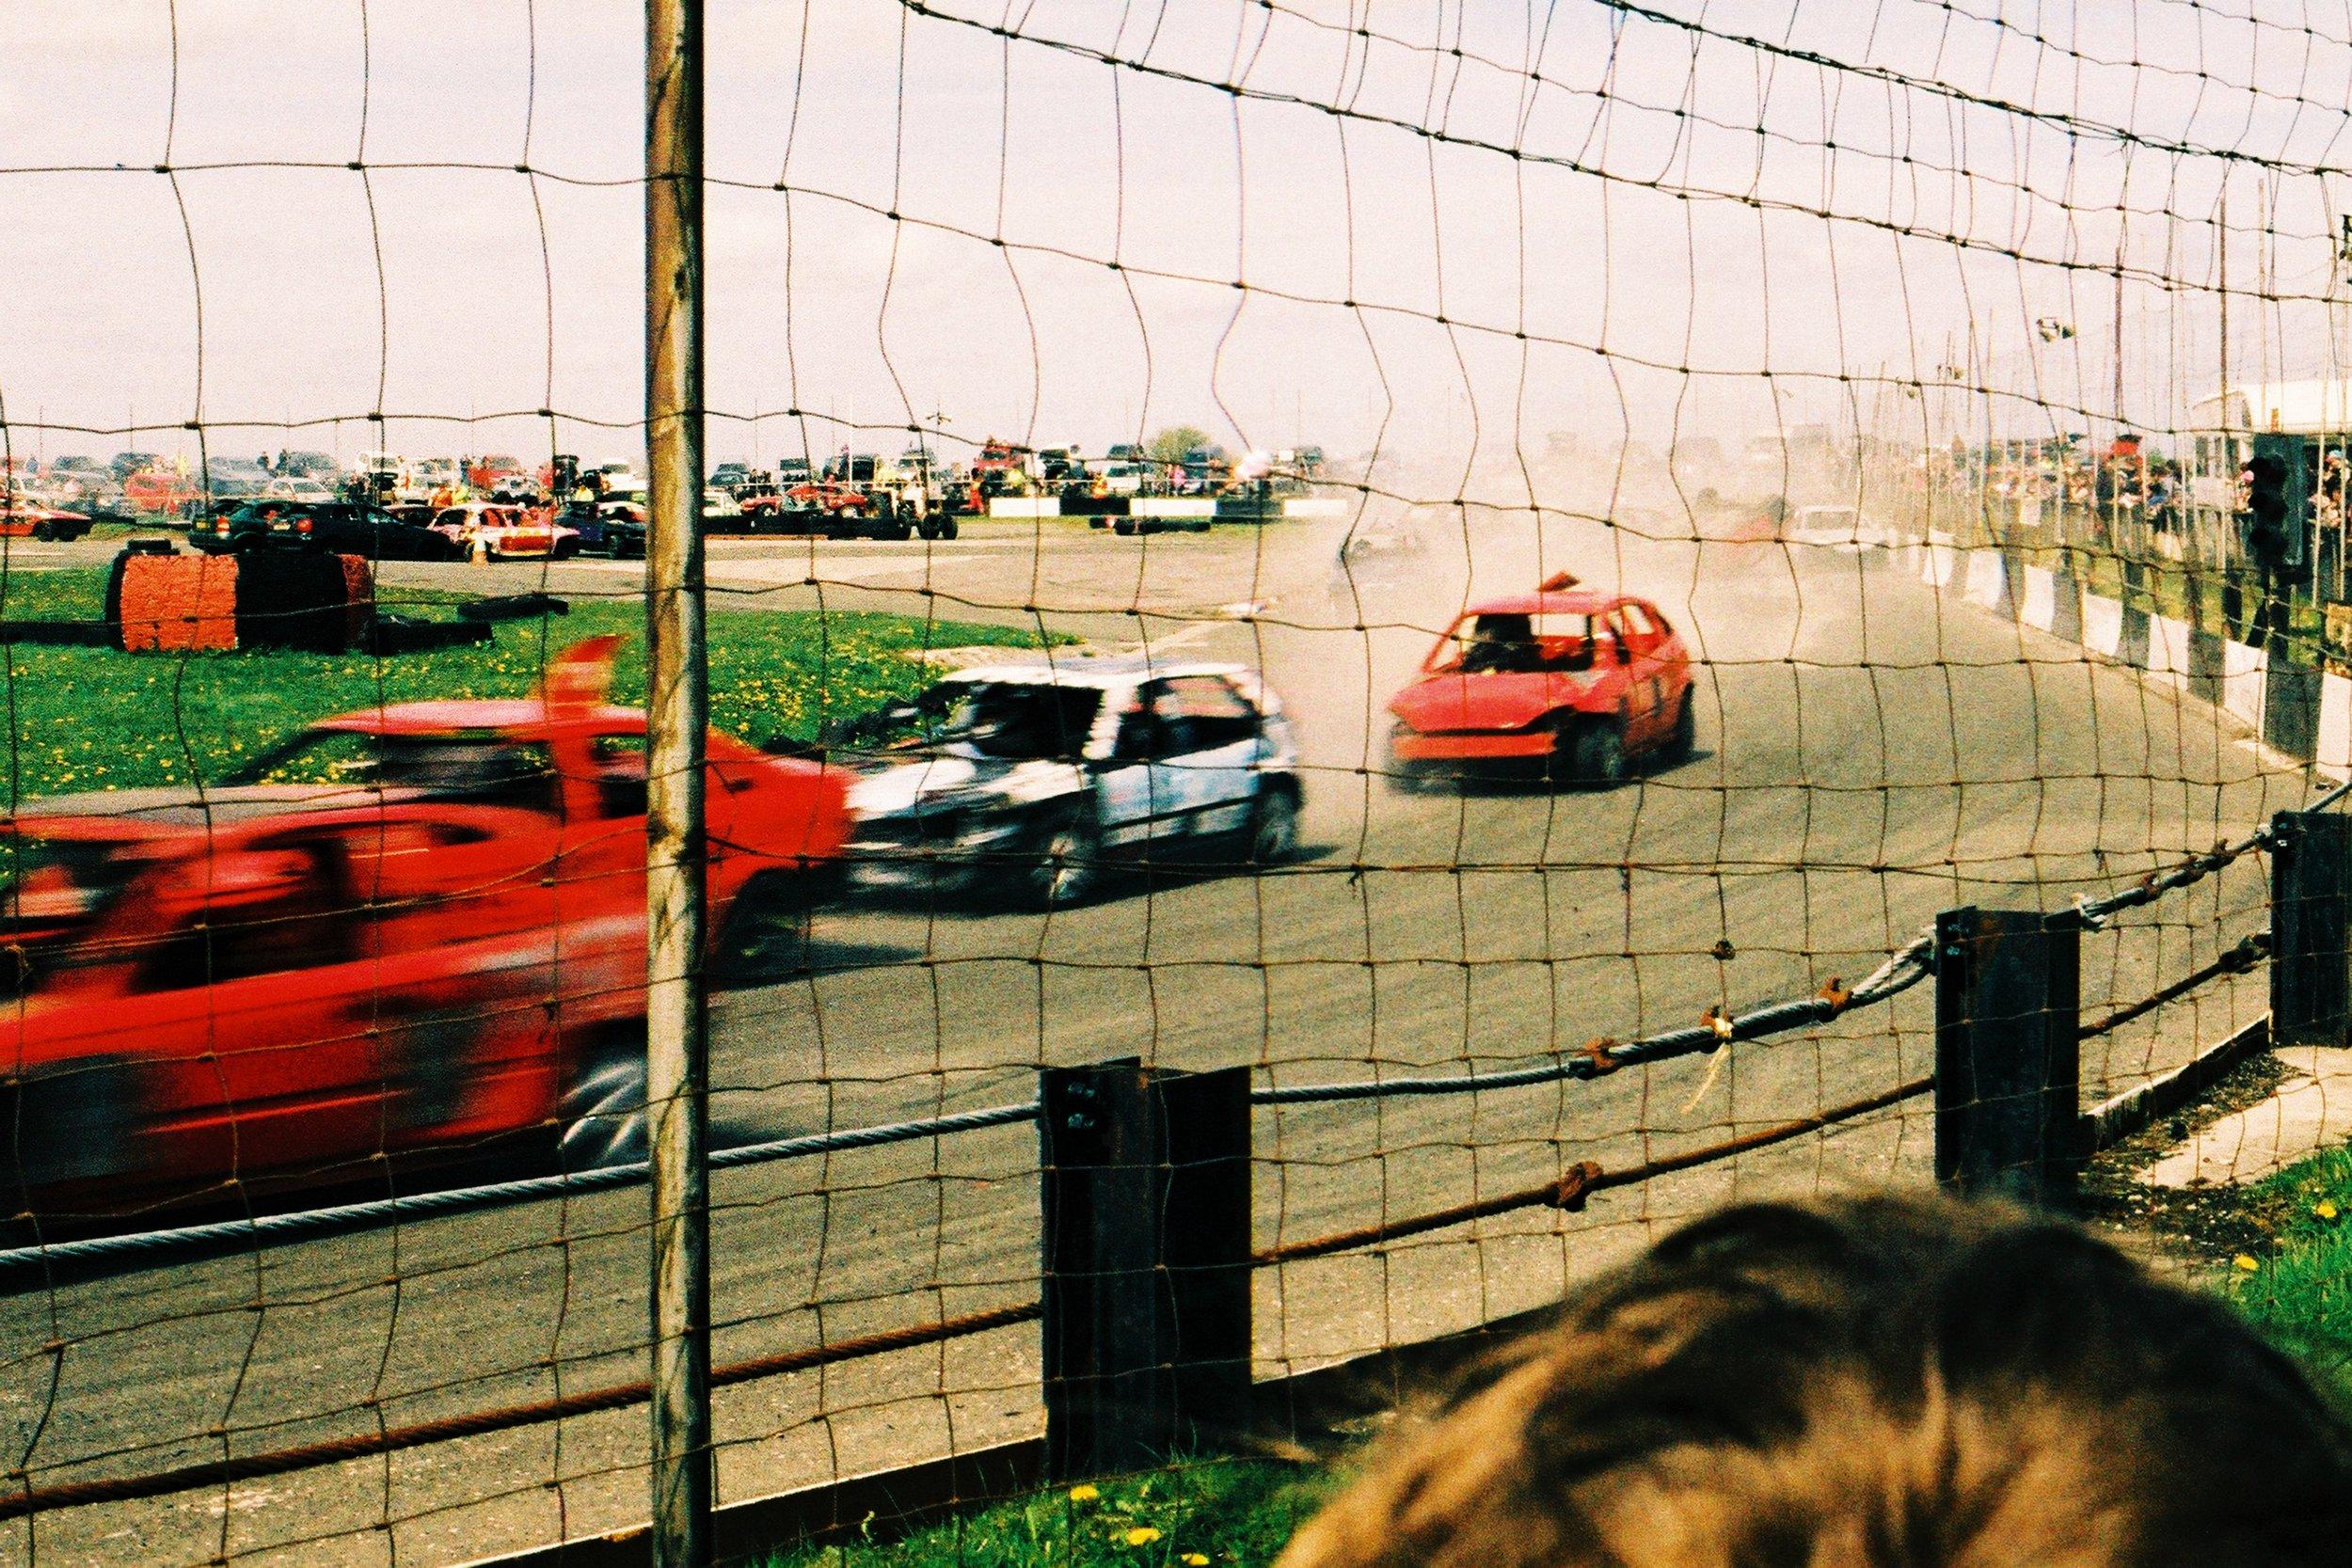 A Day at the Races | Nikon F90x | Ektachrome, x-pro | Lucy Wainwright